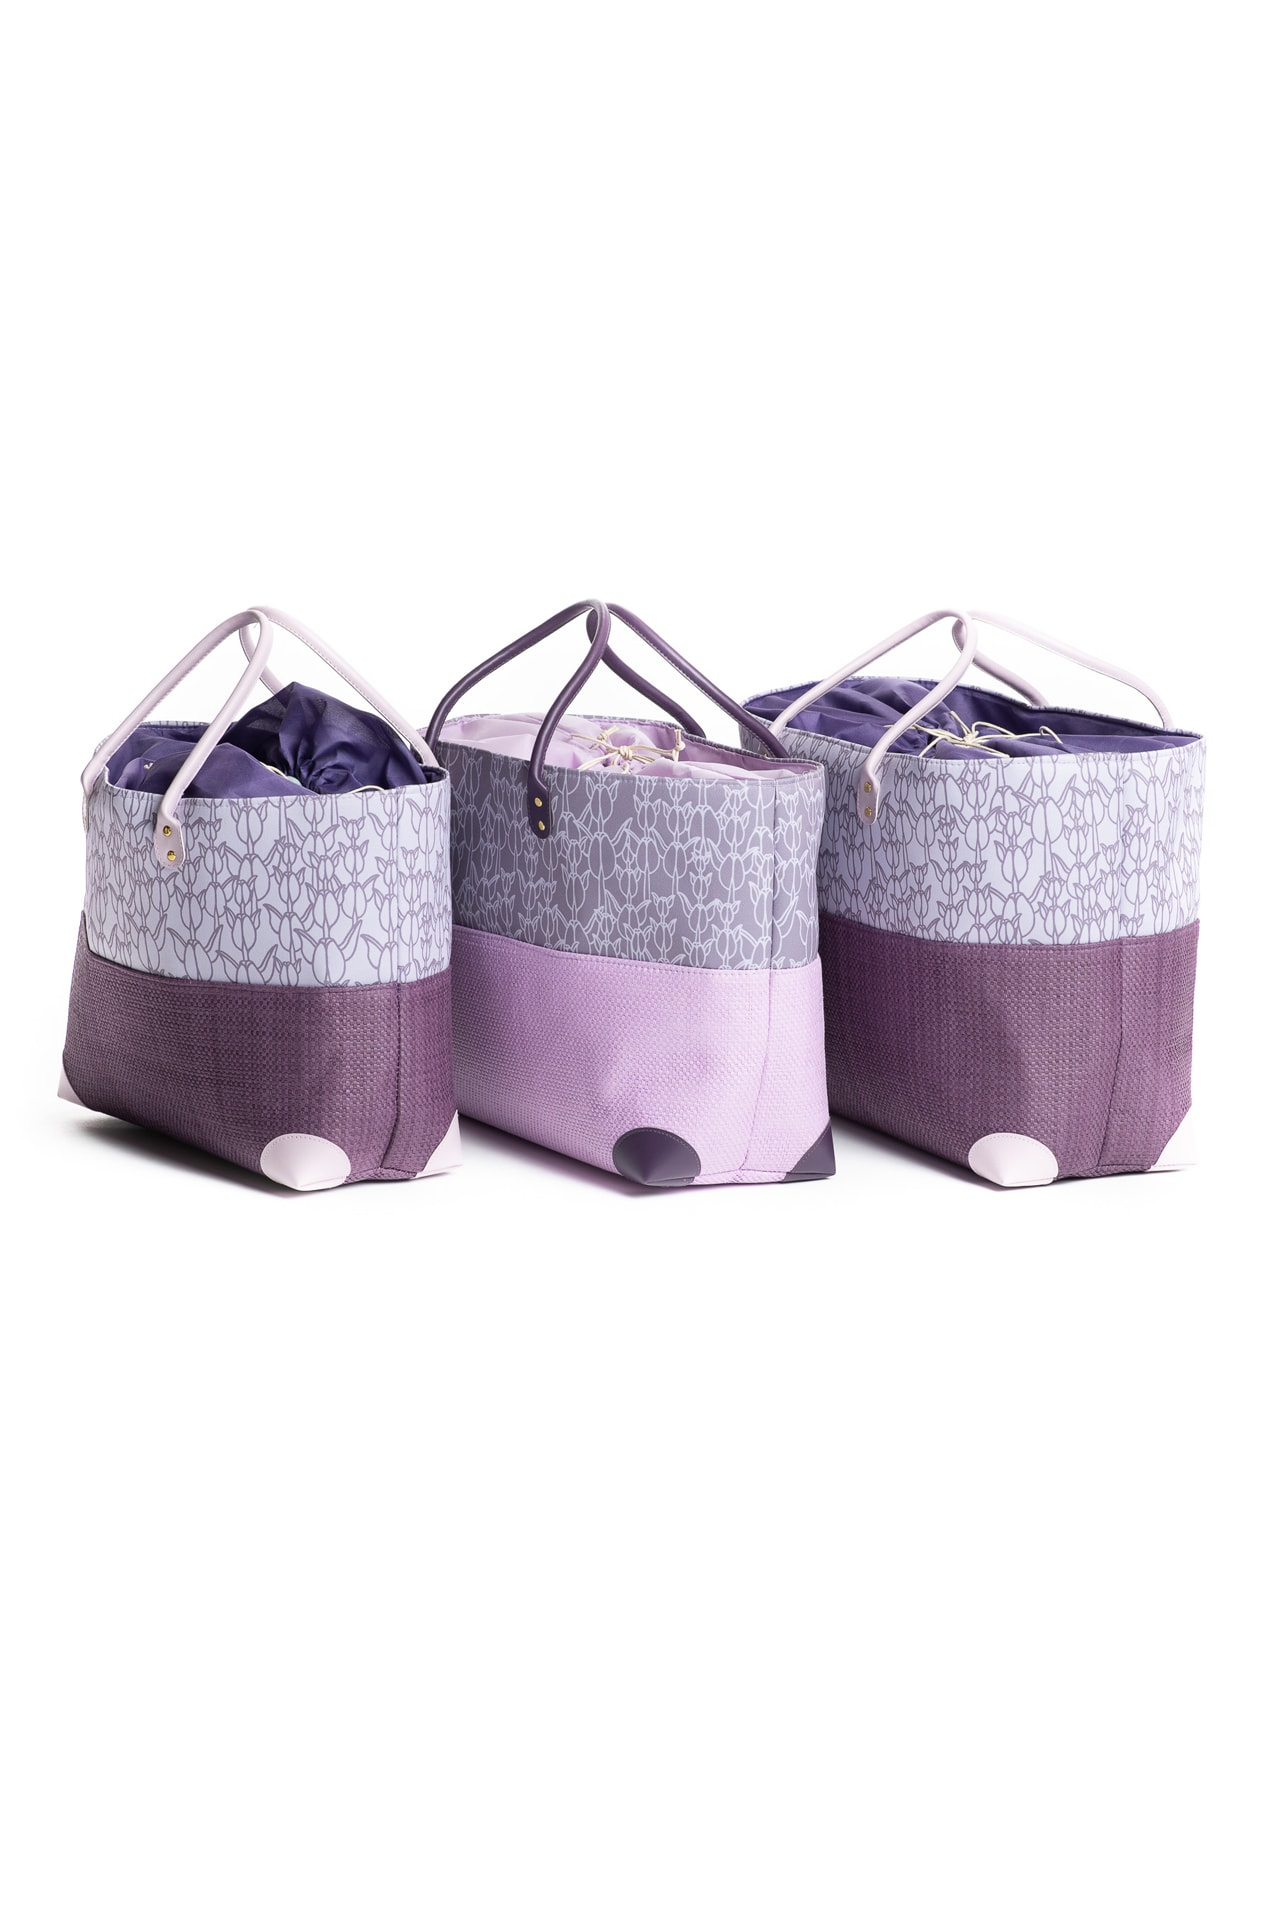 Hula Trio Bag Set in Purple Kapualiko